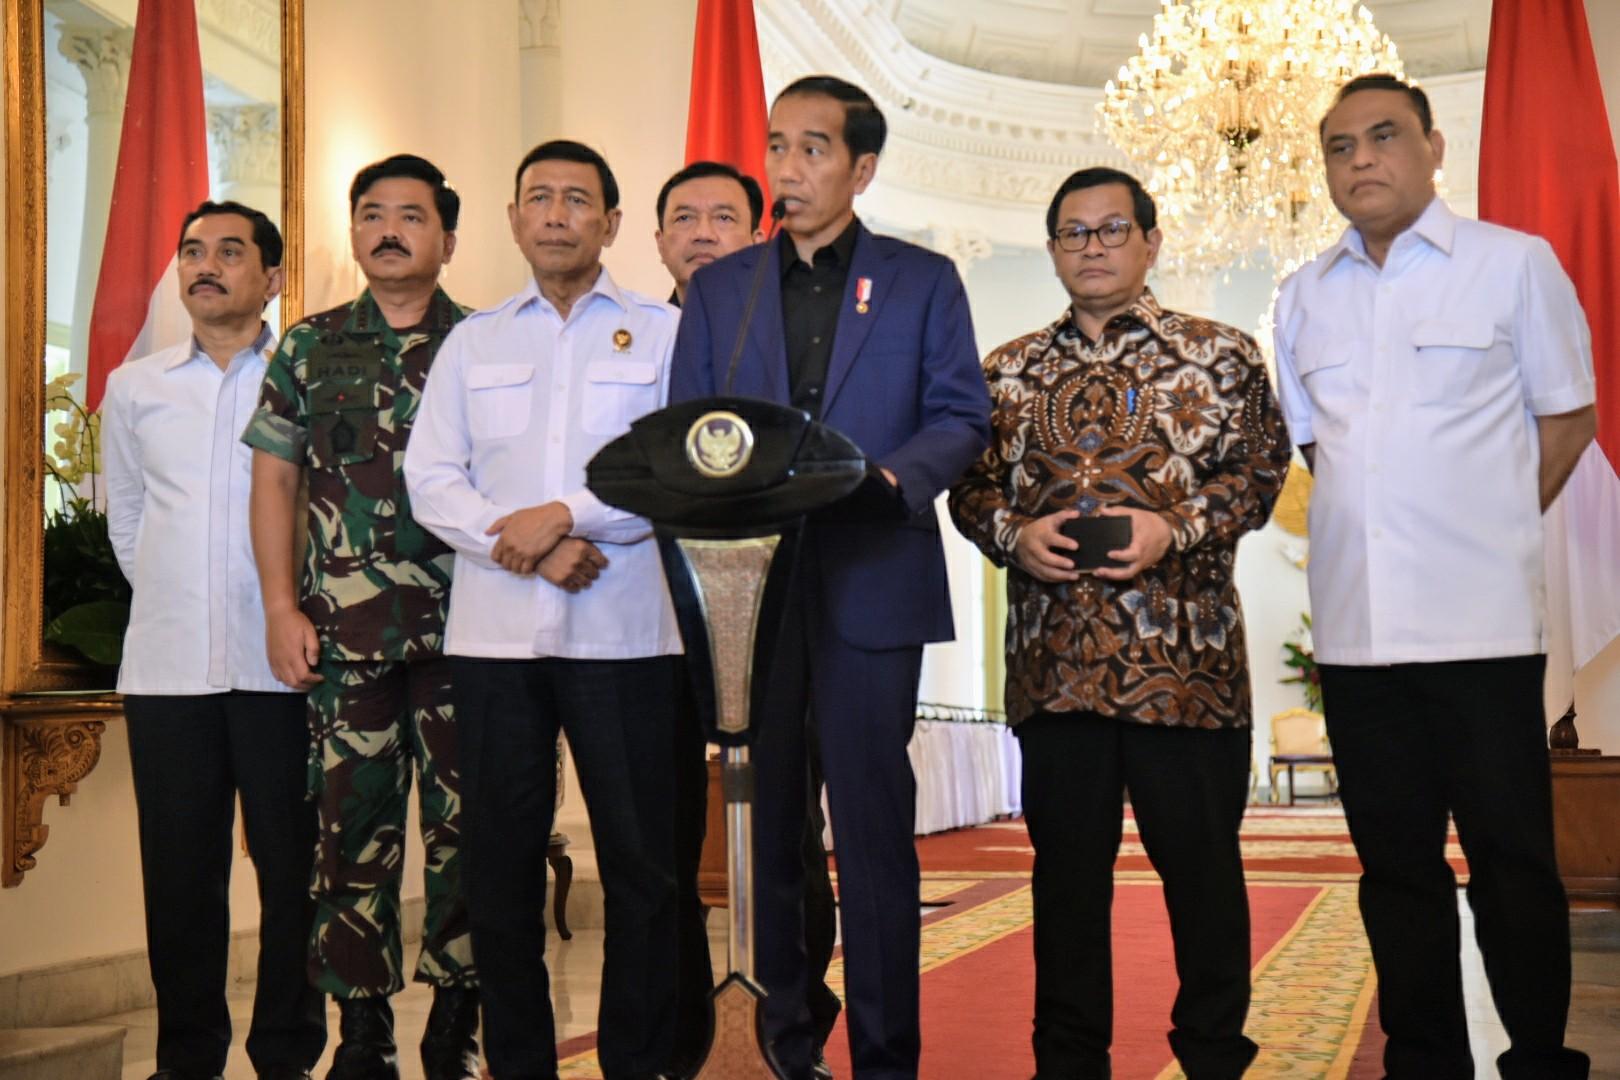 Ini pernyataan tegas Jokowi soal kerusuhan teroris di Mako Brimob